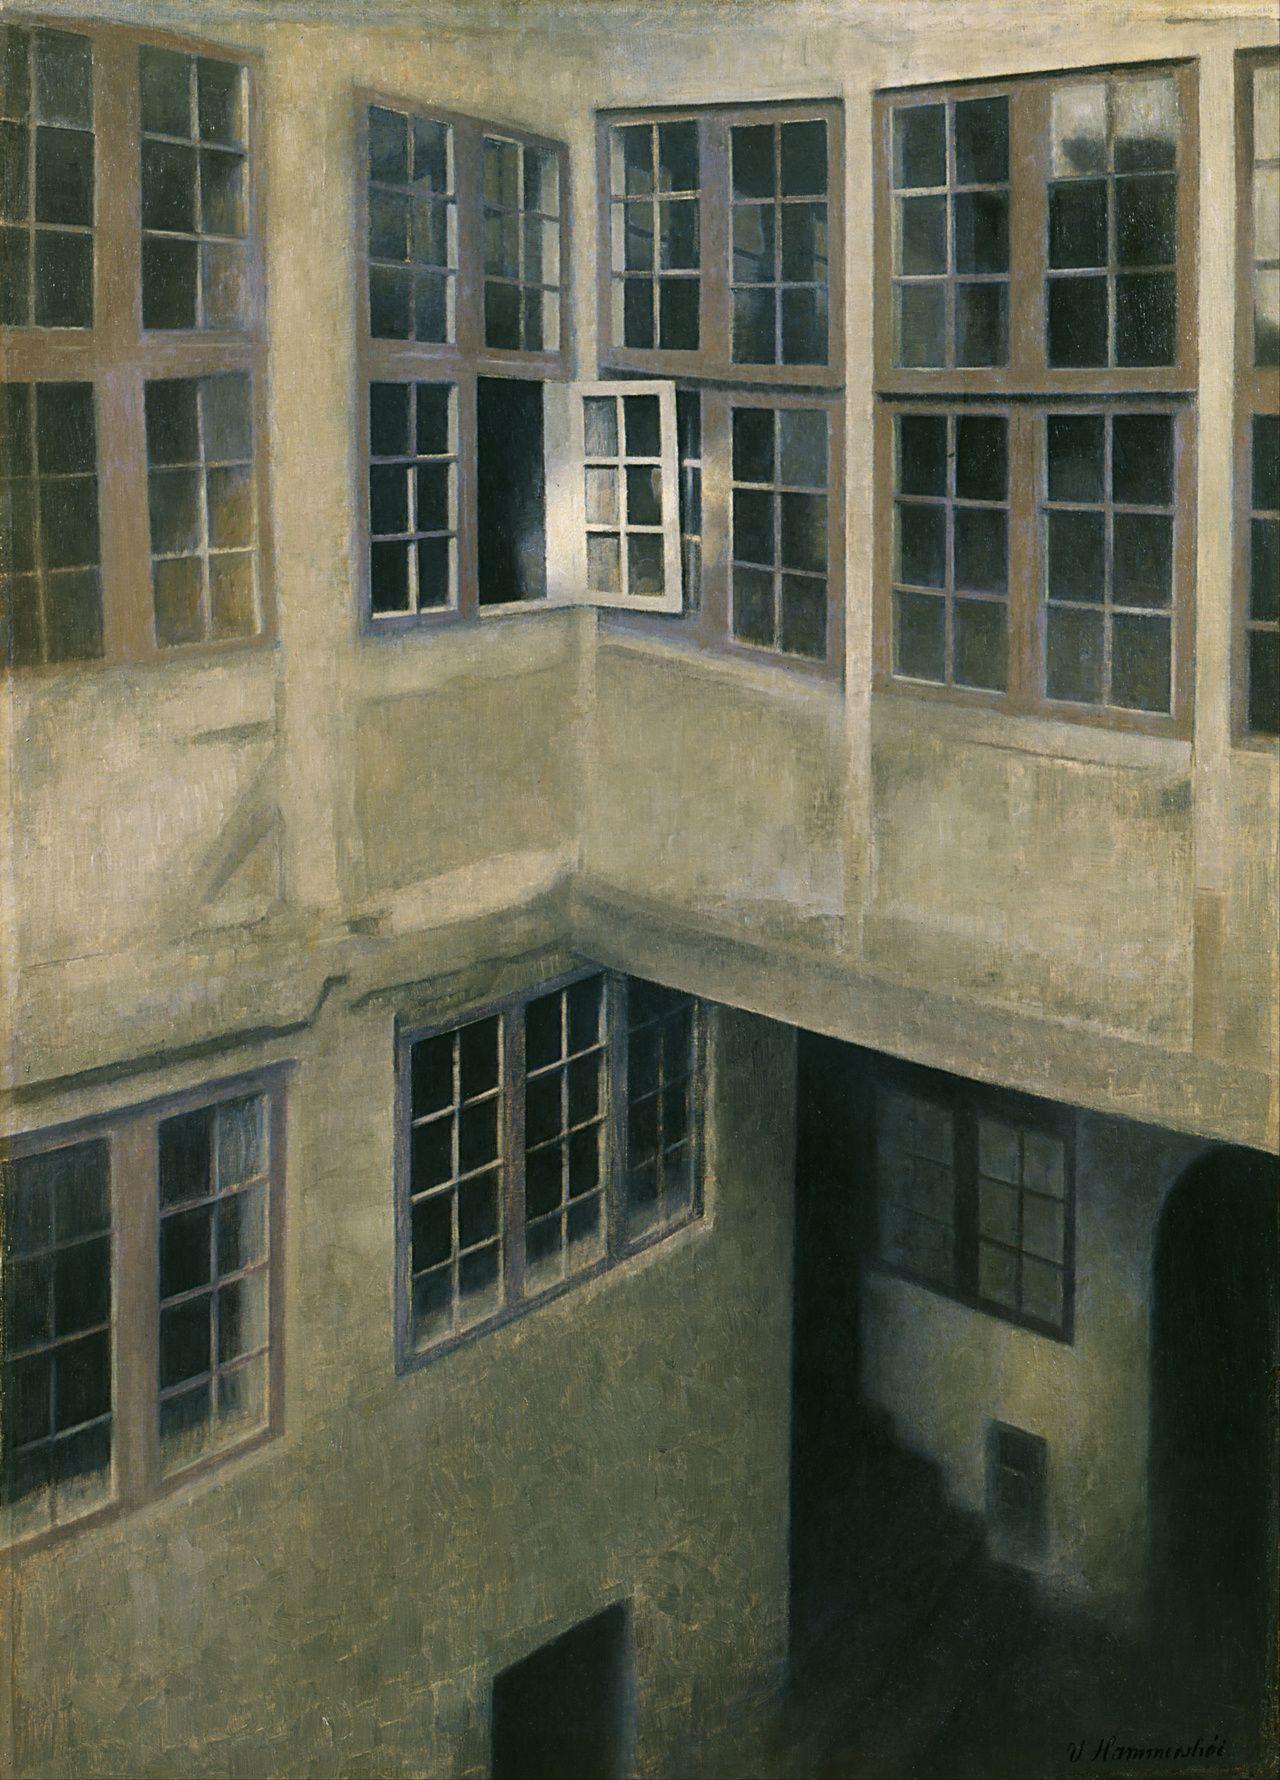 Interior of Courtyard, Vilhelm Hammershøi